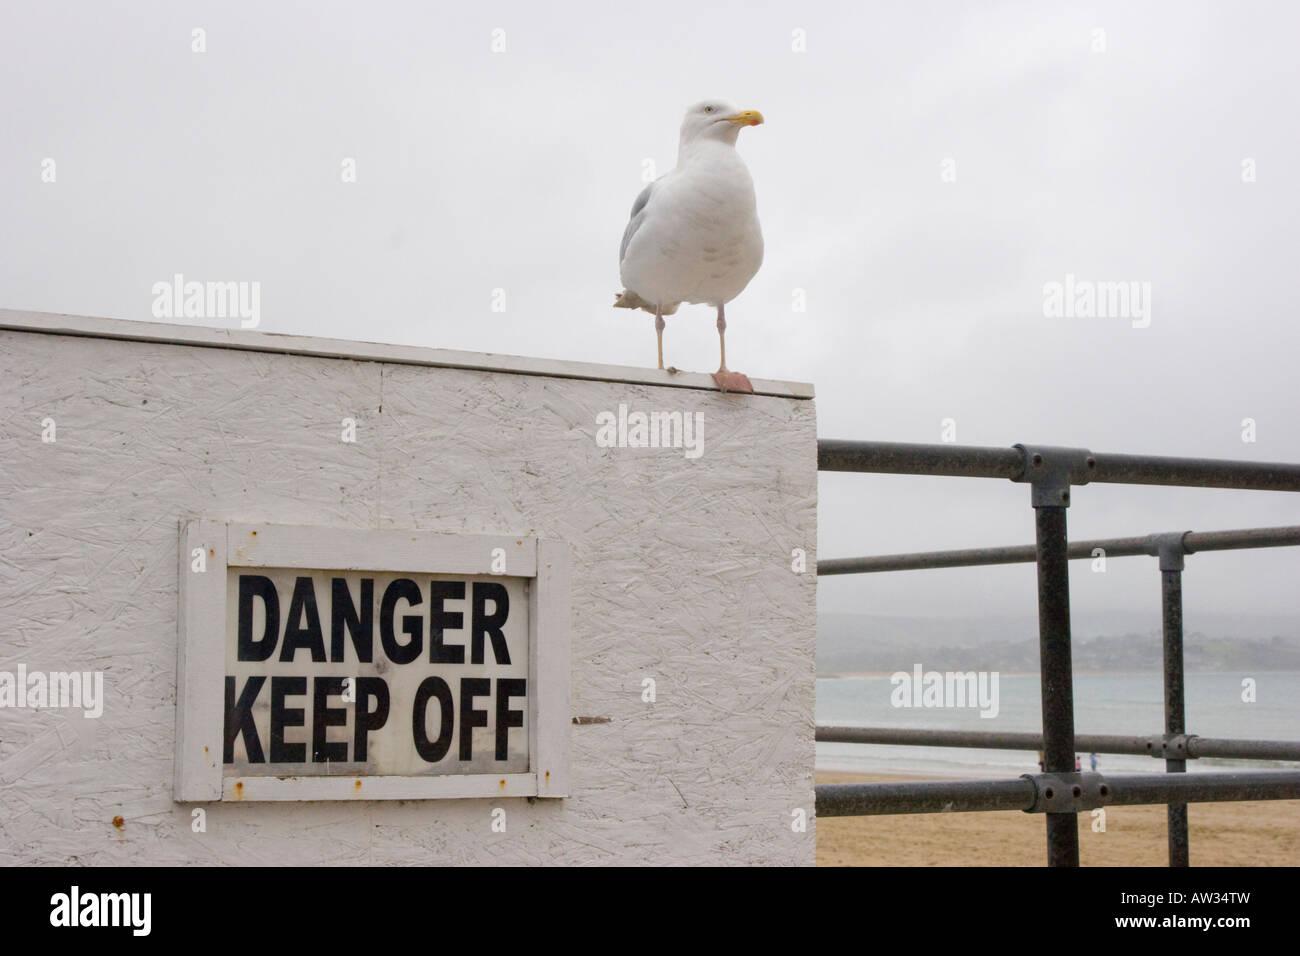 Seagulls ignoring a danger keep off warning sign - Stock Image